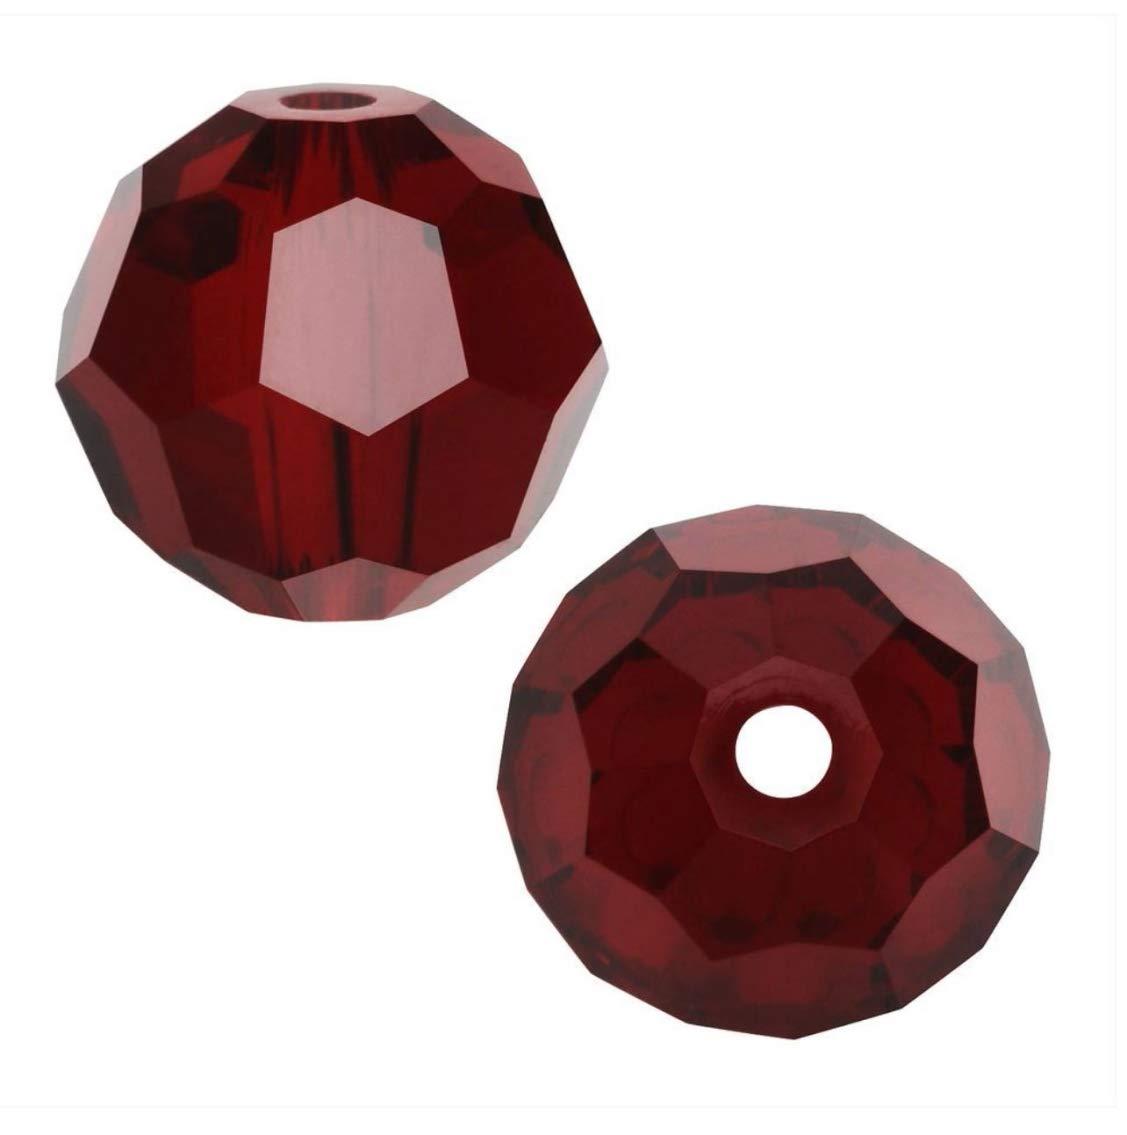 04bfb0a46b83d Amazon.com: 12pcs Swarovski 4mm Small #5000 Round Siam Red Crystal ...